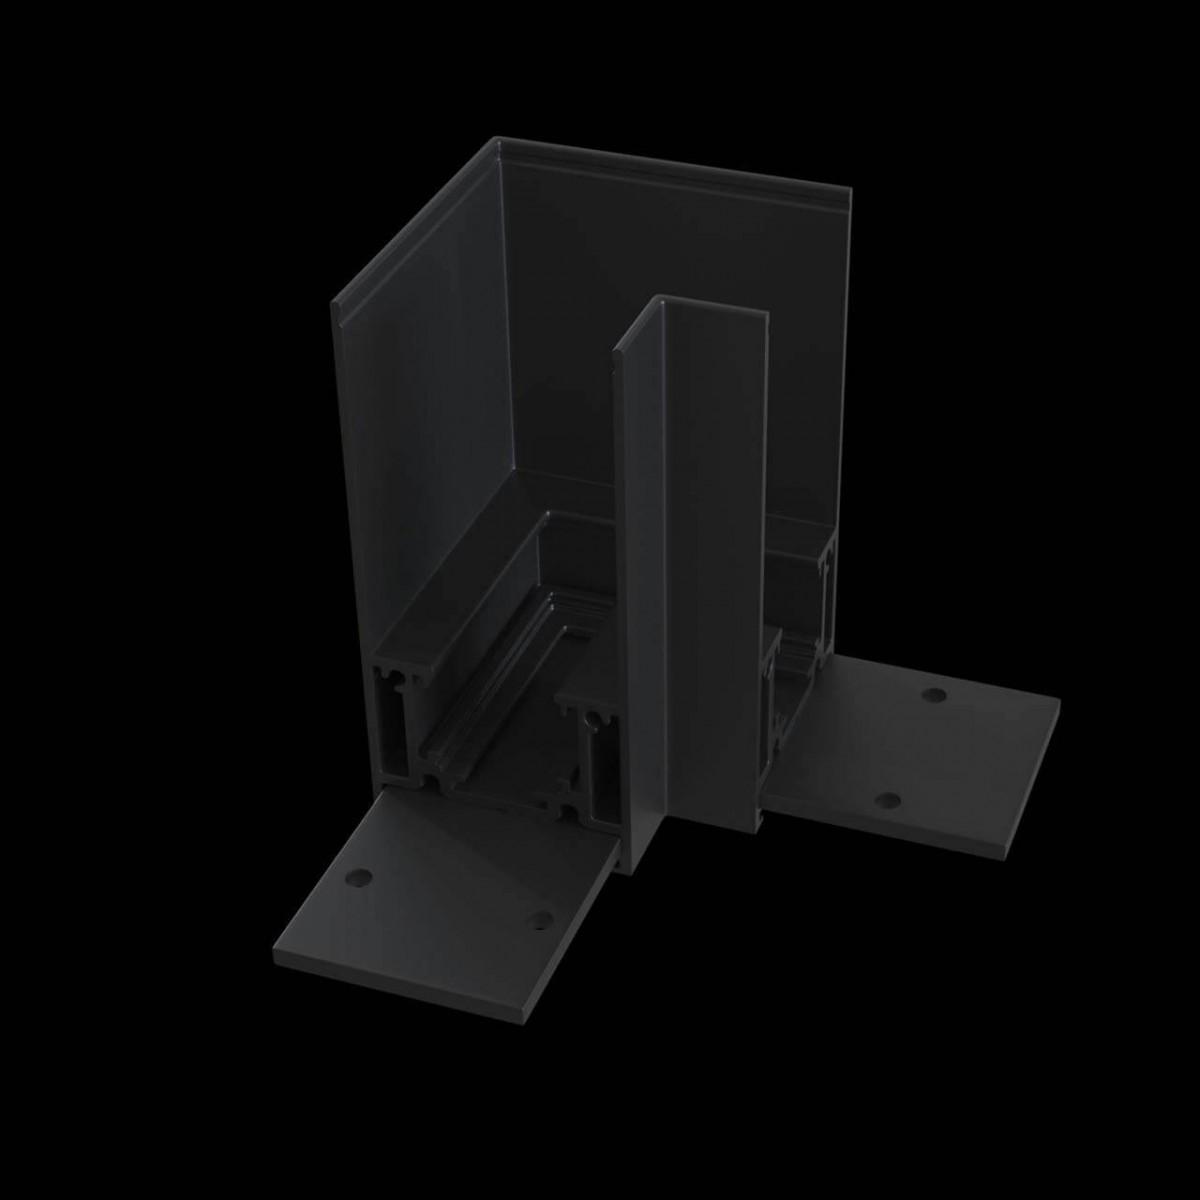 Угловой коннектор Maytoni Accessories for tracks TRA004CL-21B